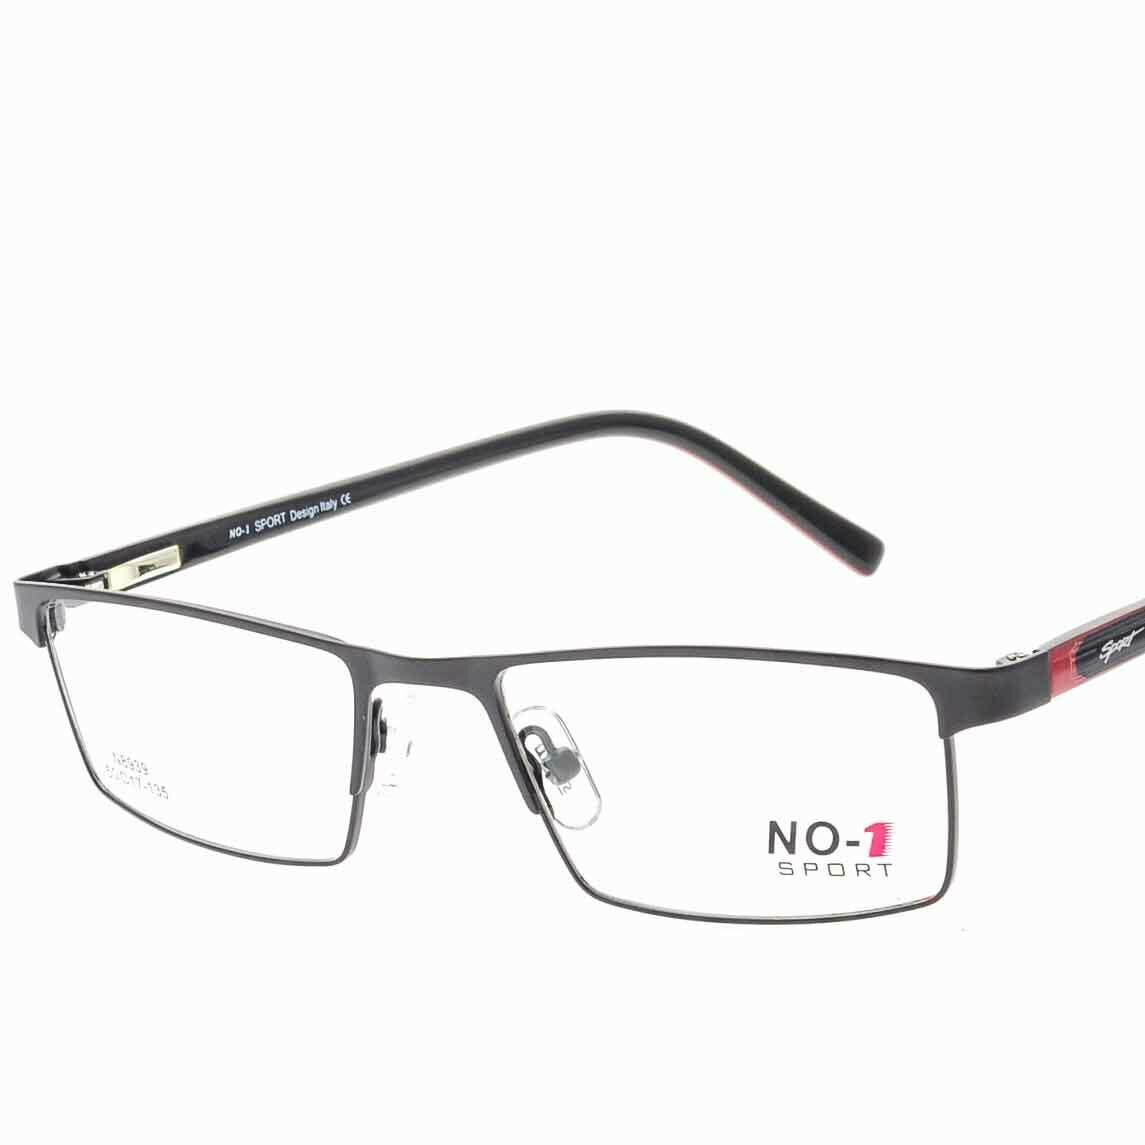 NO-1 SPORT N8939